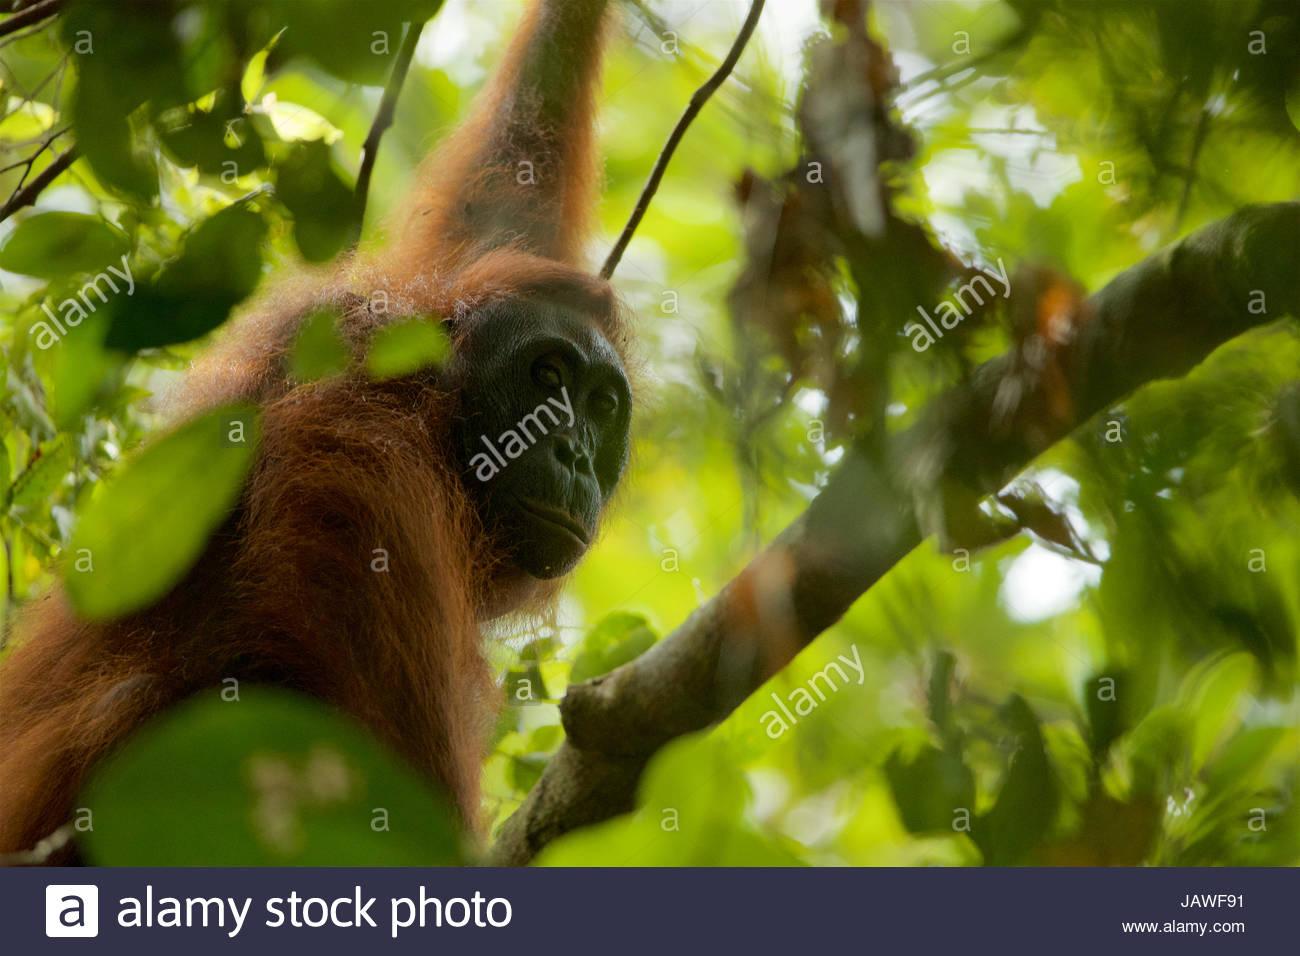 Una femmina di orangutan, pongo pygmaeus wurmbii, poggia in una struttura ad albero in Gunung Palung National Park. Immagini Stock